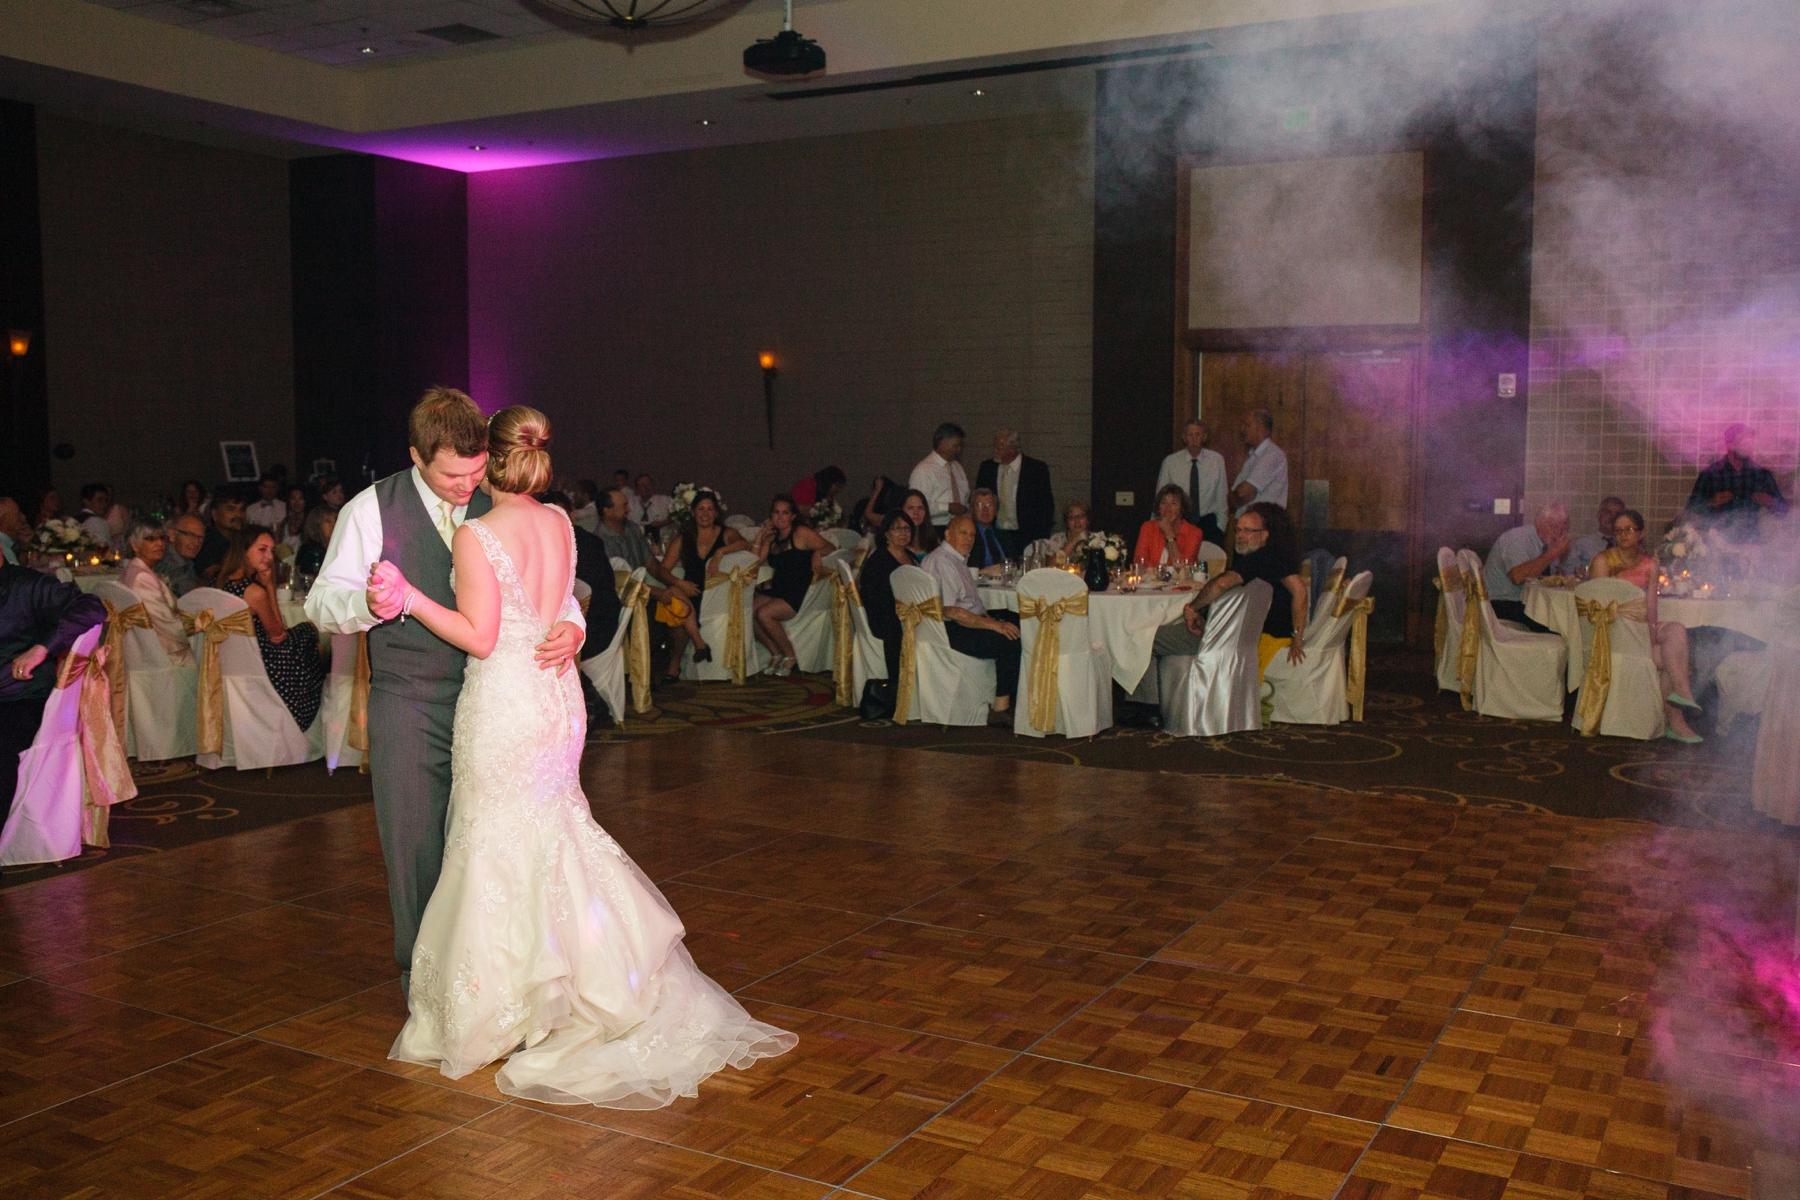 Ben_Jillian_Midland_Baycity_Wedding_0074.jpg